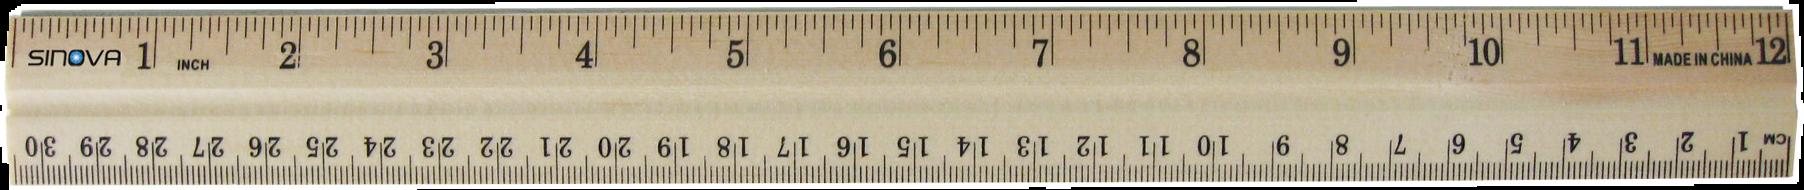 ruler scale freetoedit